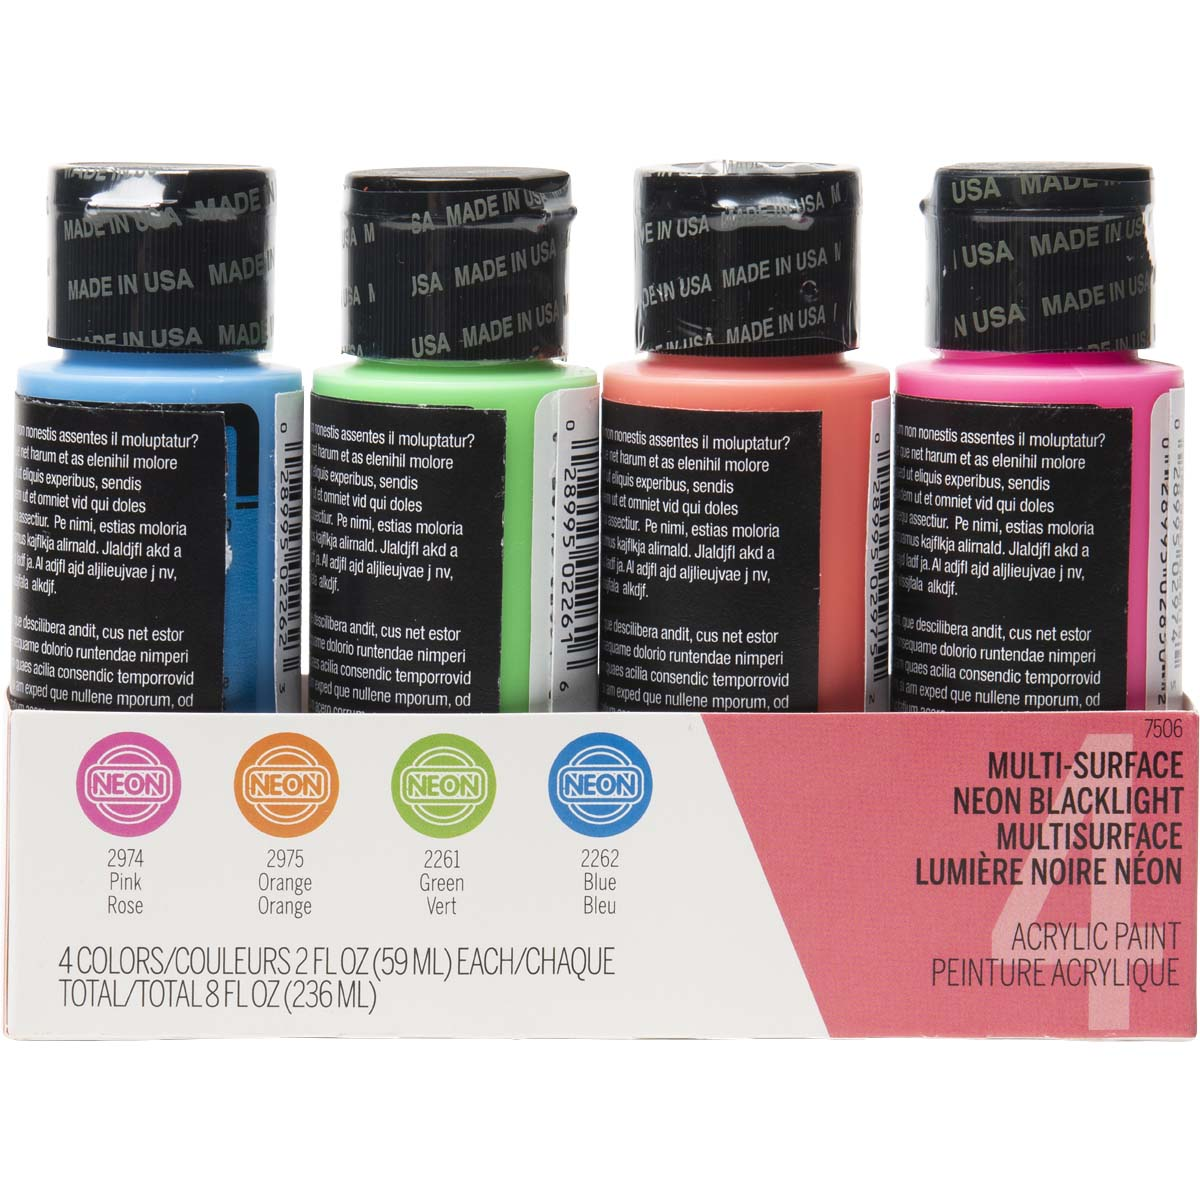 FolkArt ® Multi-Surface Neon Blacklight™ Acrylic Paint Set 4 Color - 7506